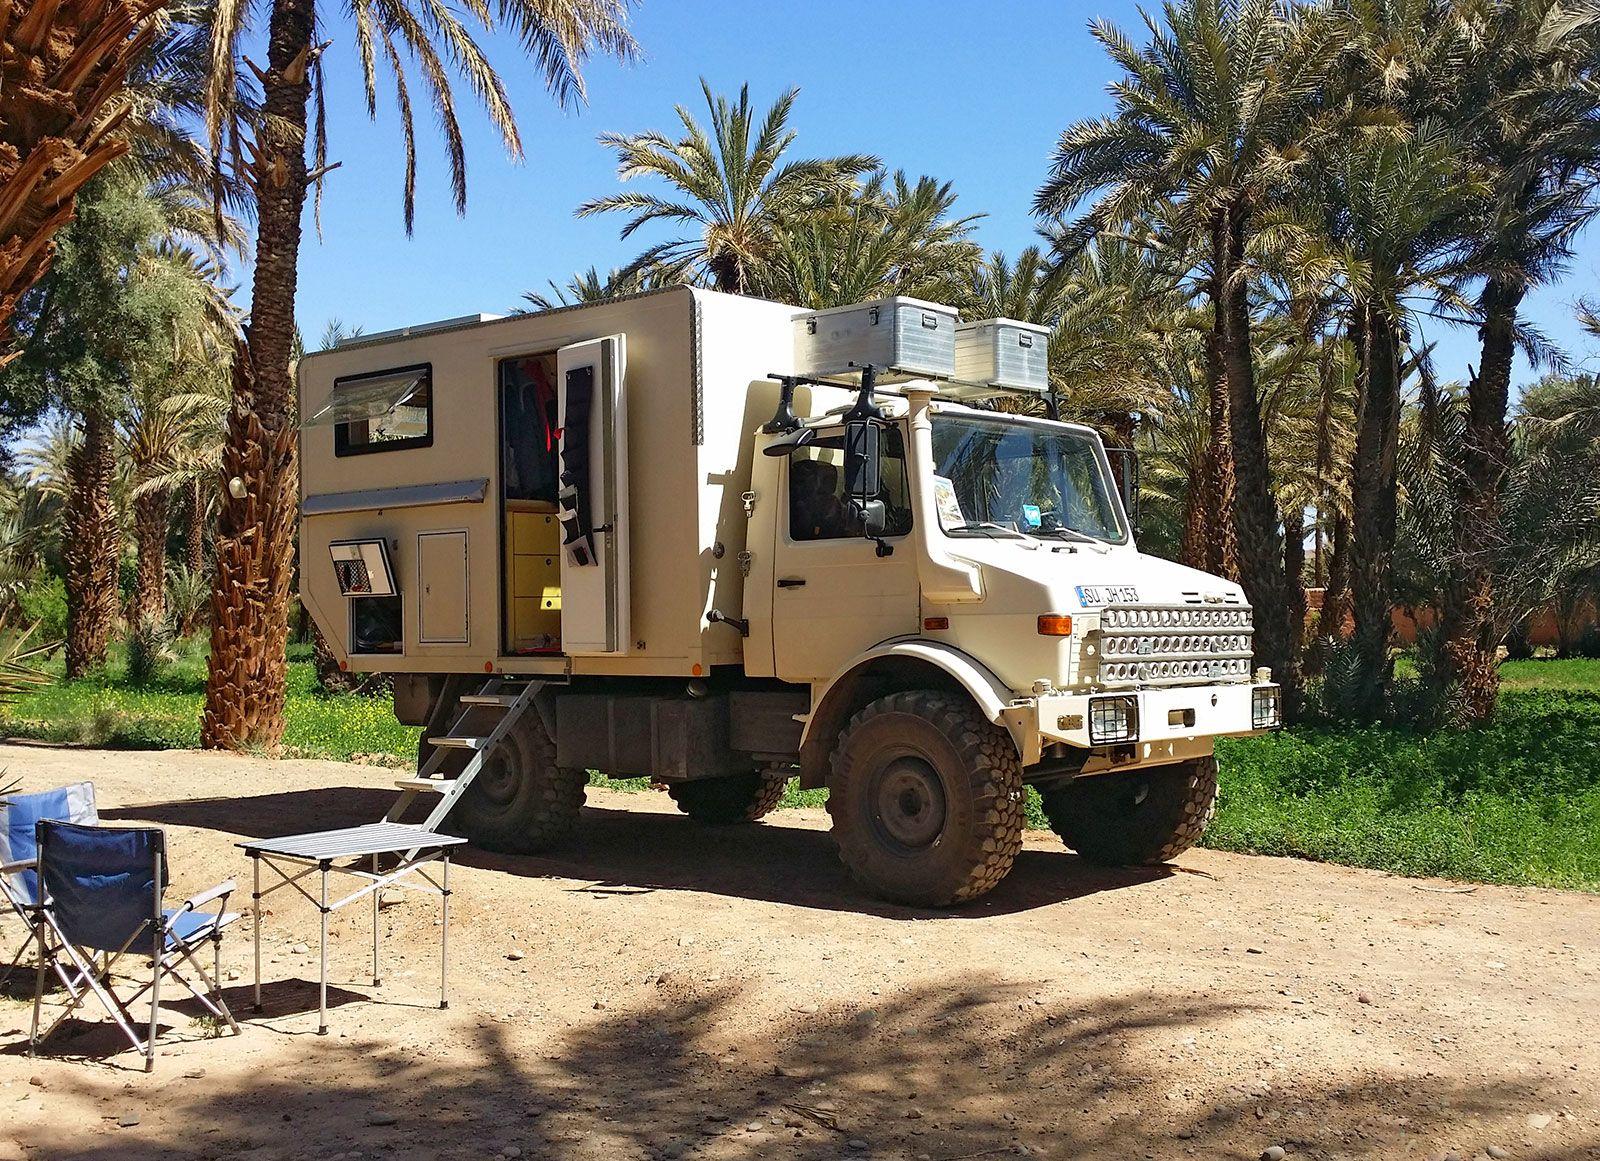 unimog 1300l safari und expeditionswagen 4wd campers pinterest expedition car expedition. Black Bedroom Furniture Sets. Home Design Ideas